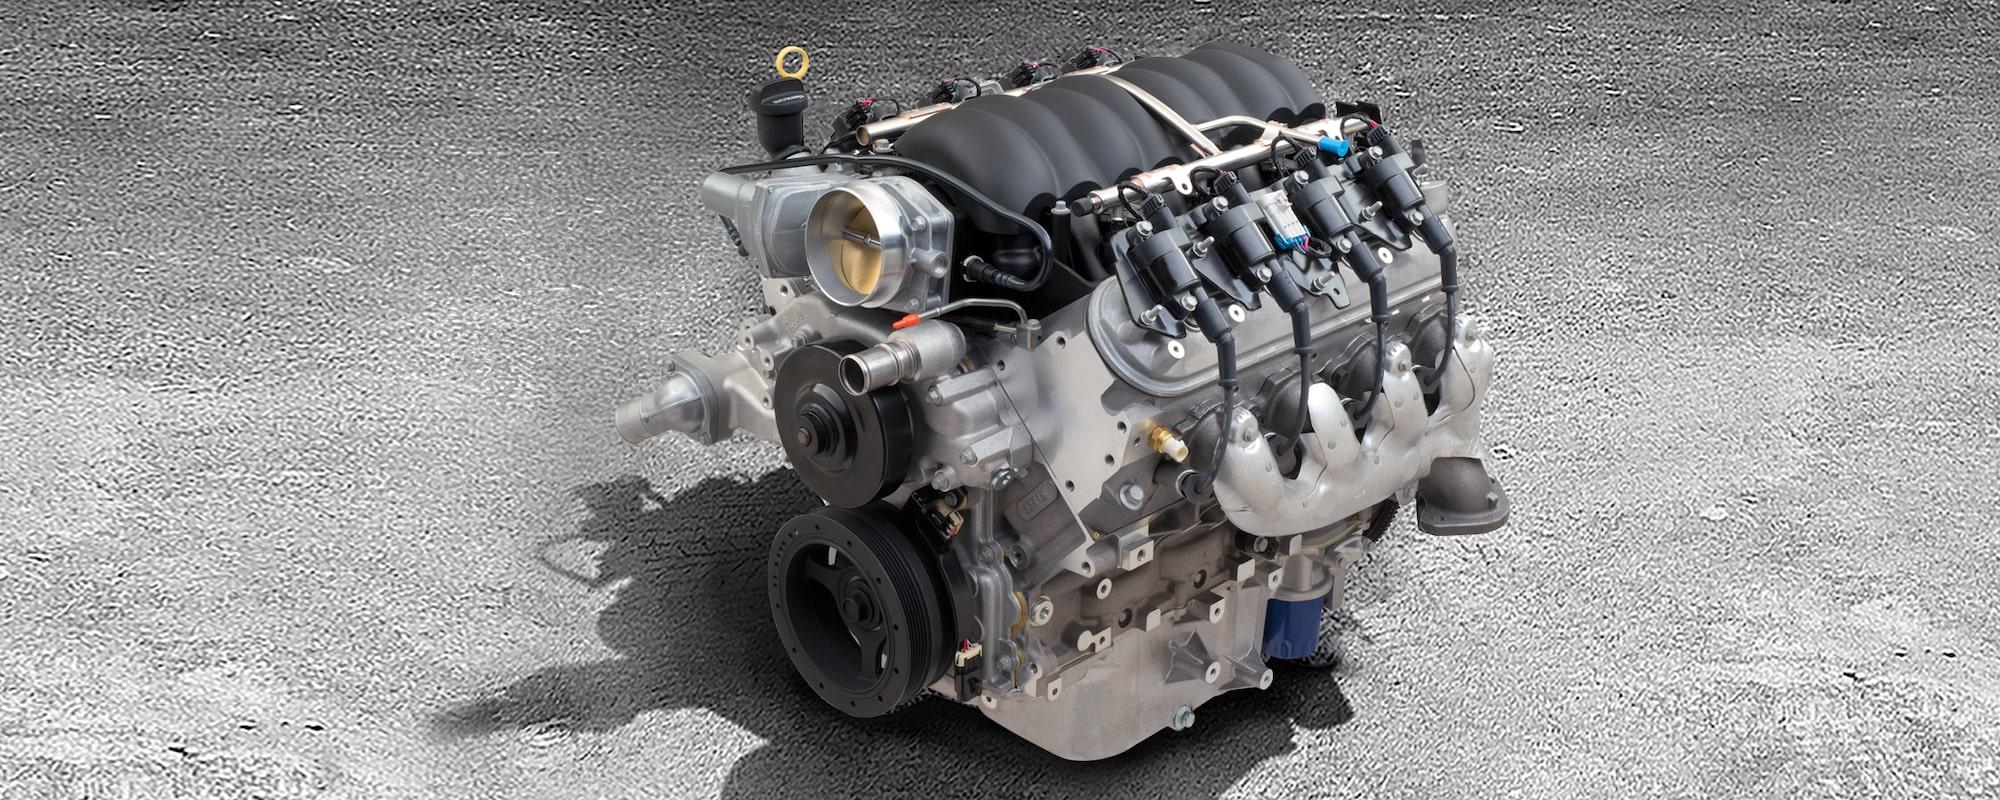 medium resolution of ls3 crate engine race engine chevrolet performancels3 crate engine wiring diagram 15